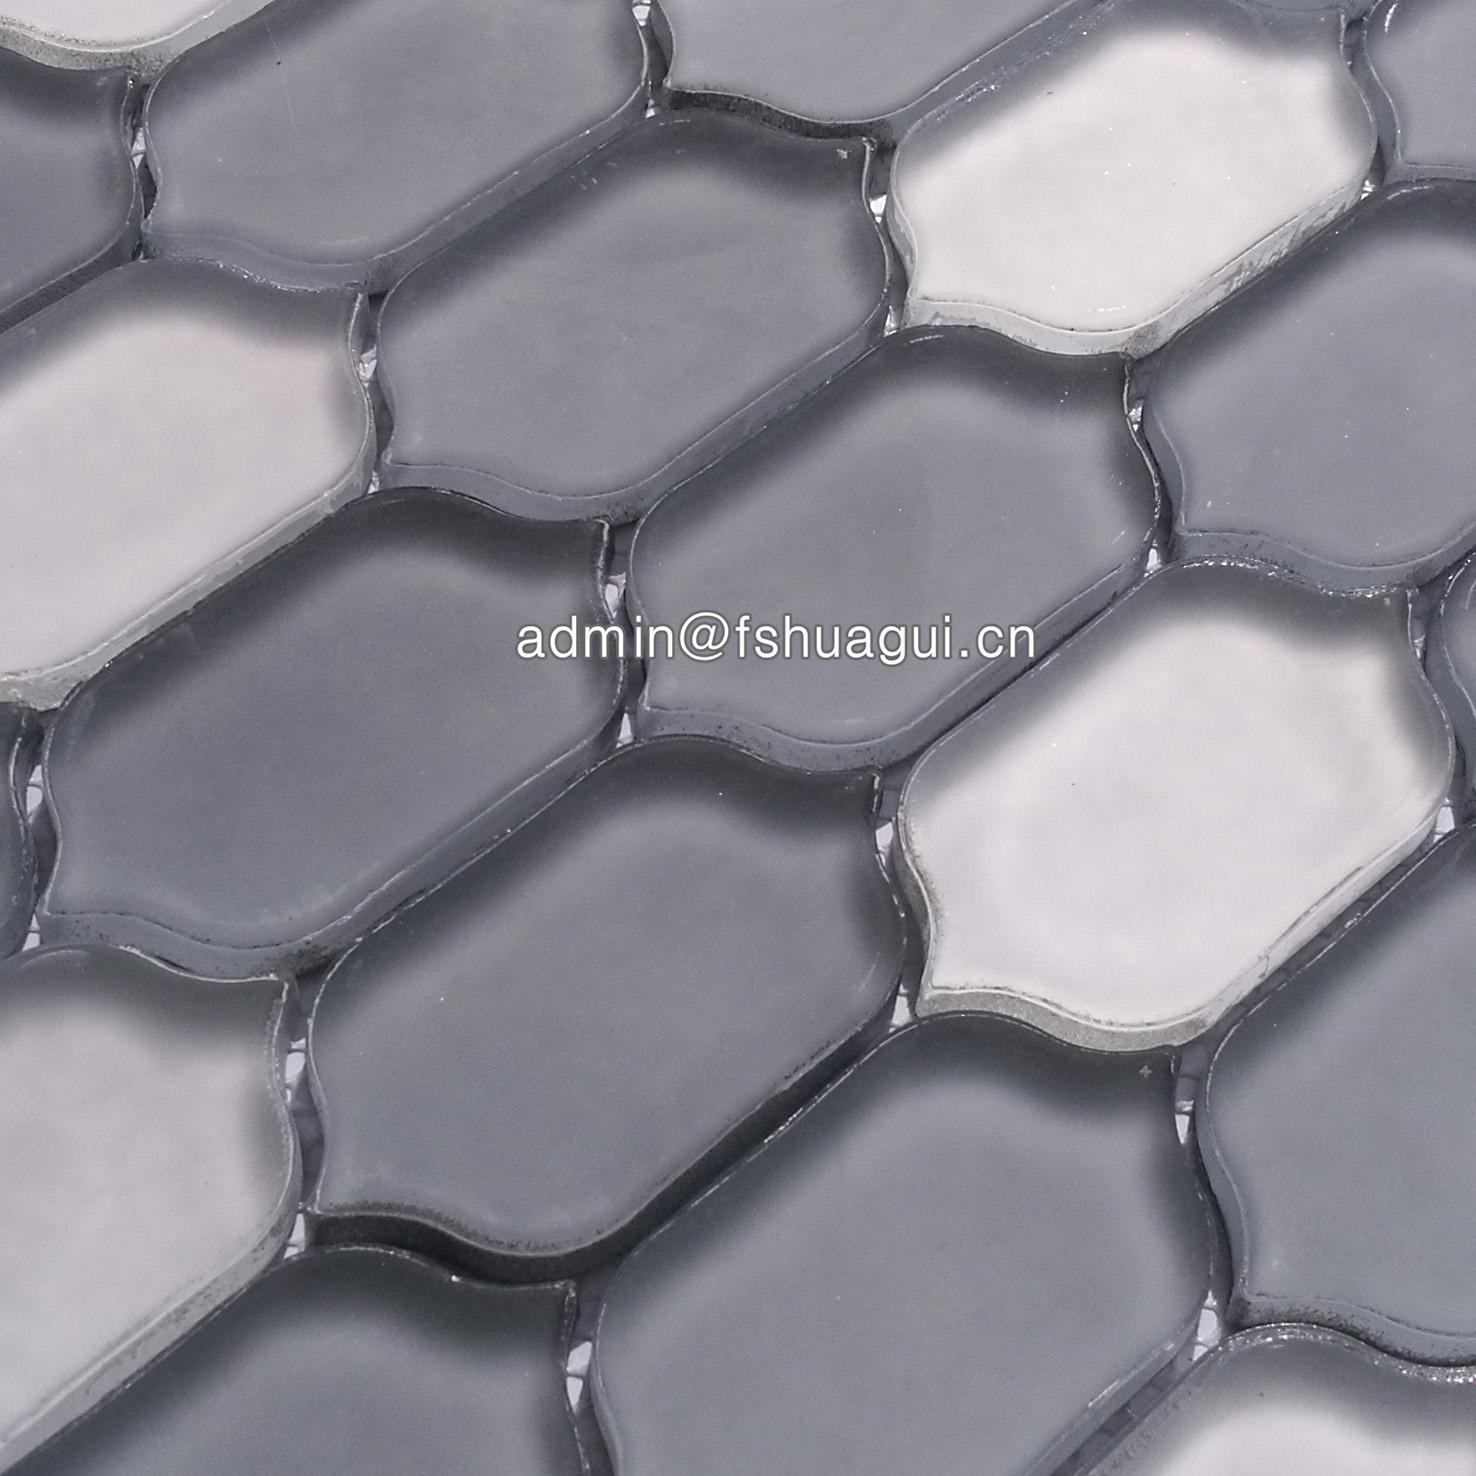 Huagui Interlocking long hexagon glass mosaic tile HG-WJ406 GLASS MOSAIC TILE image26